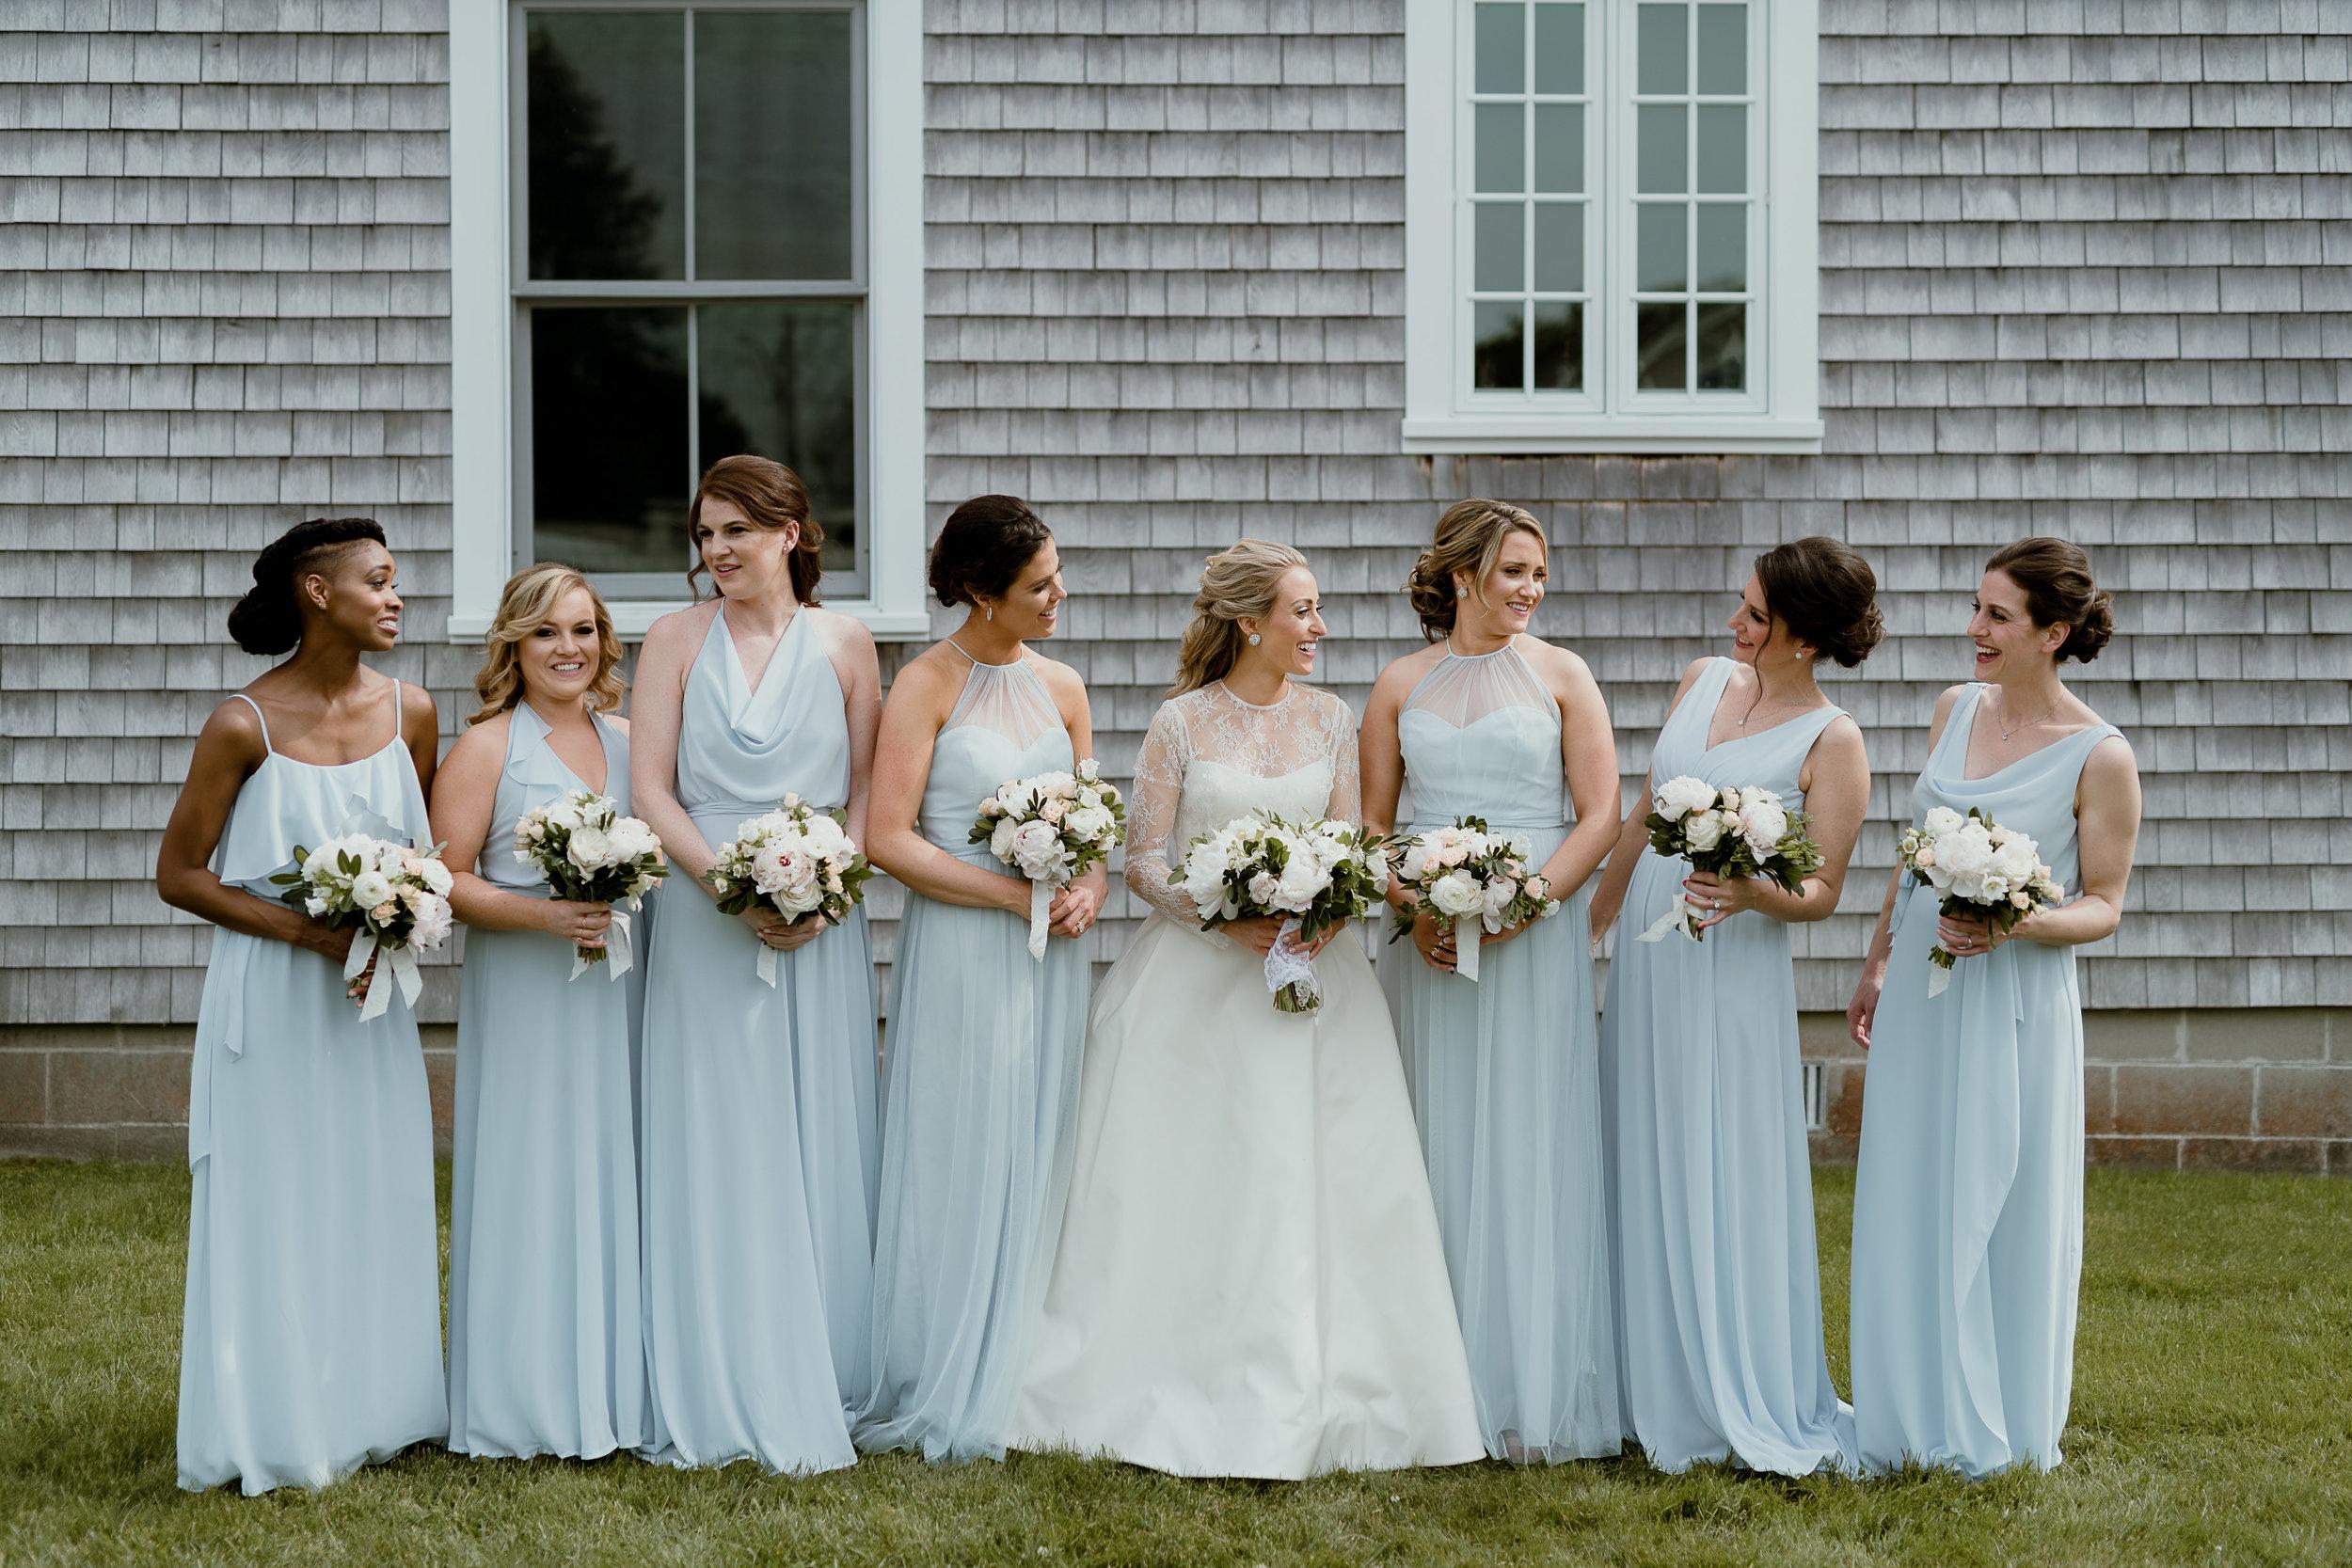 Green & White Wedding Jonathon Edwards Vineyard Wedding0-527.jpg